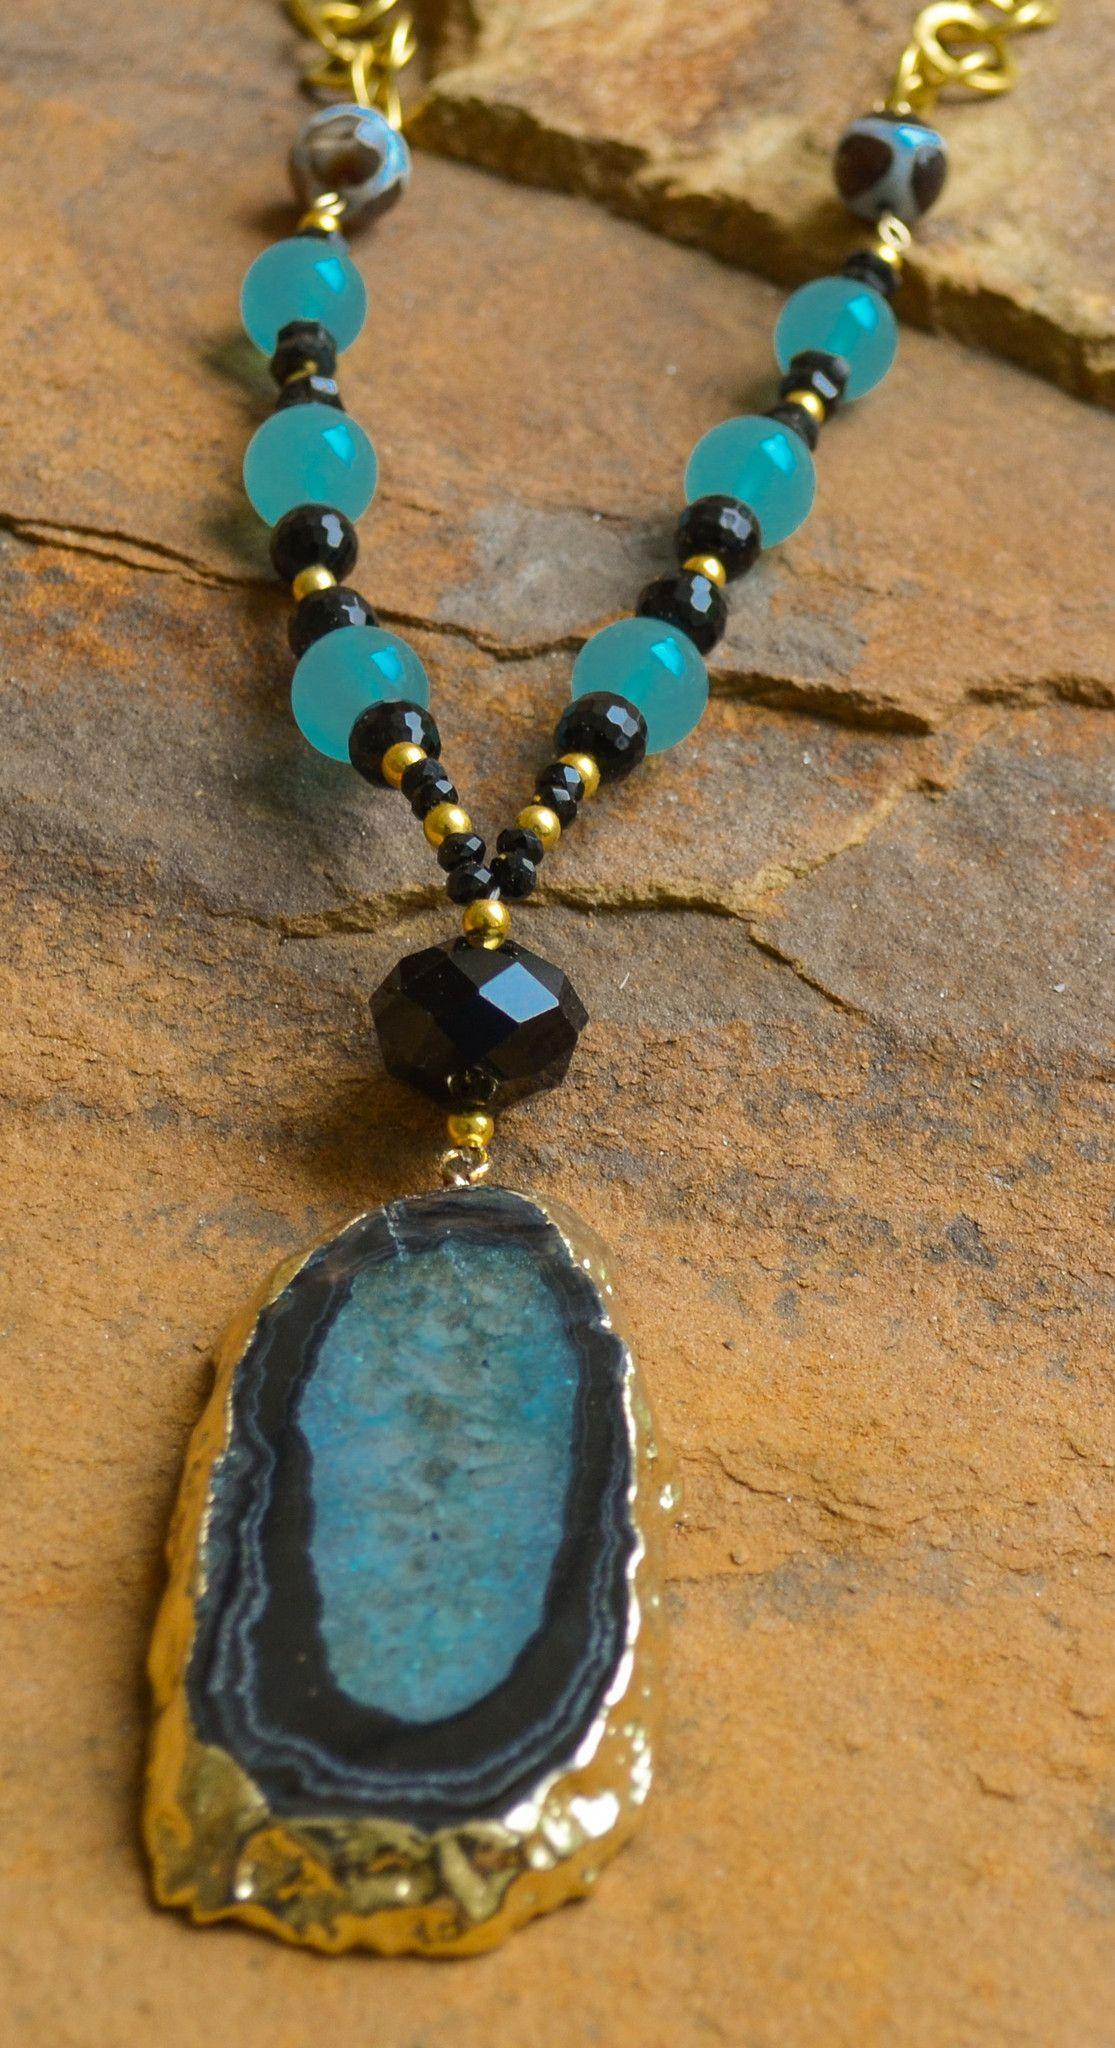 Black aqua agate necklace nayan pinterest agate aqua and